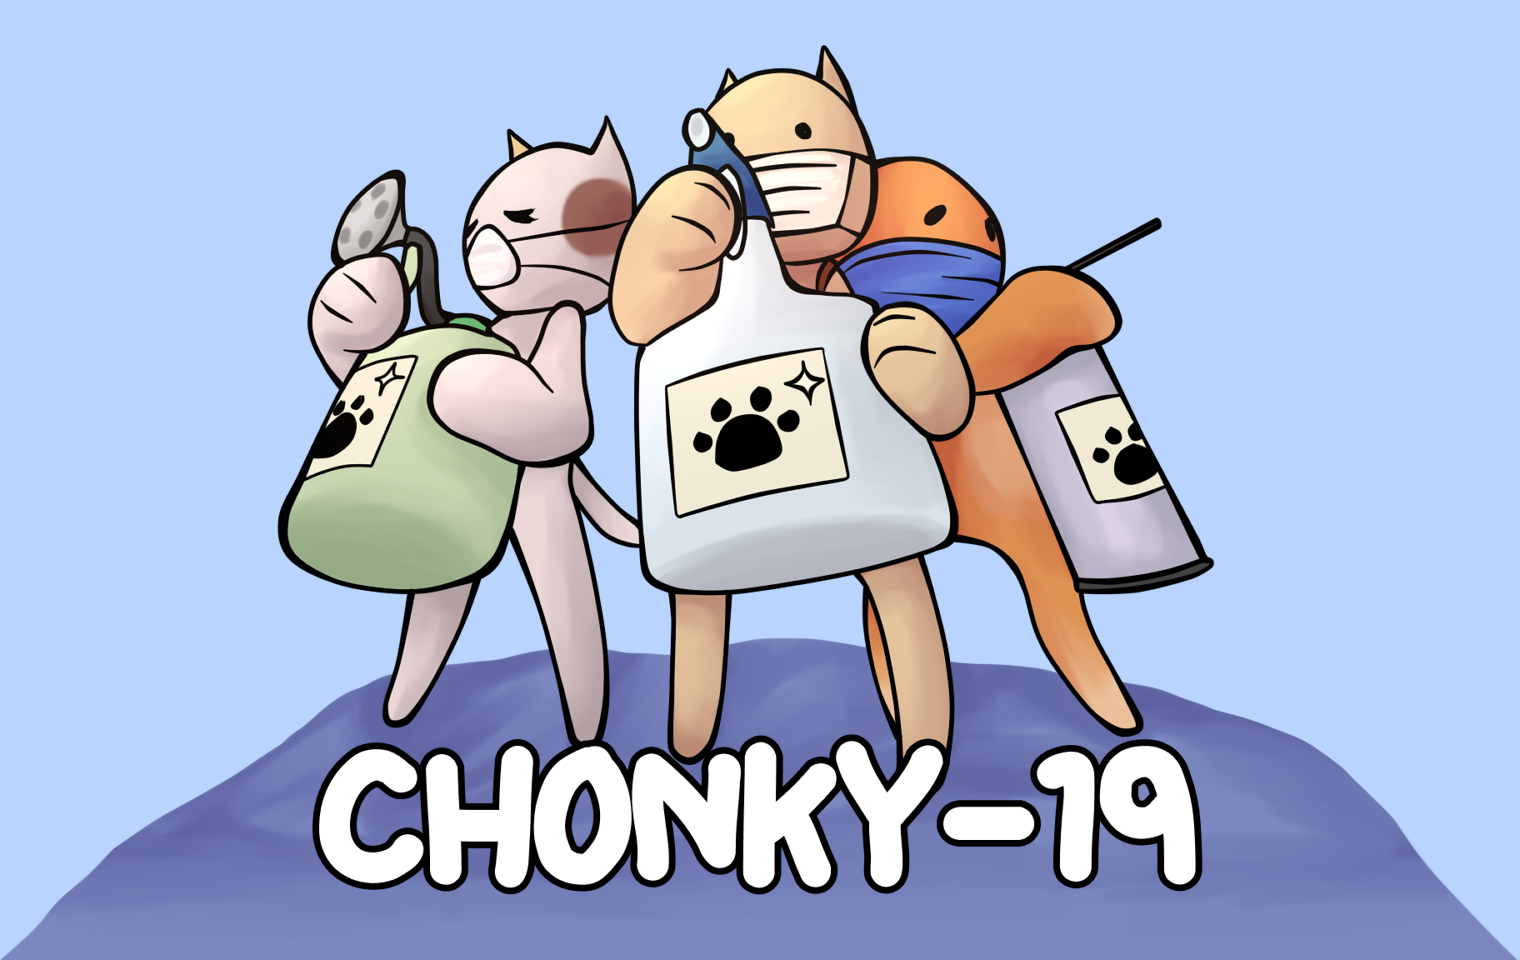 Chonky-19